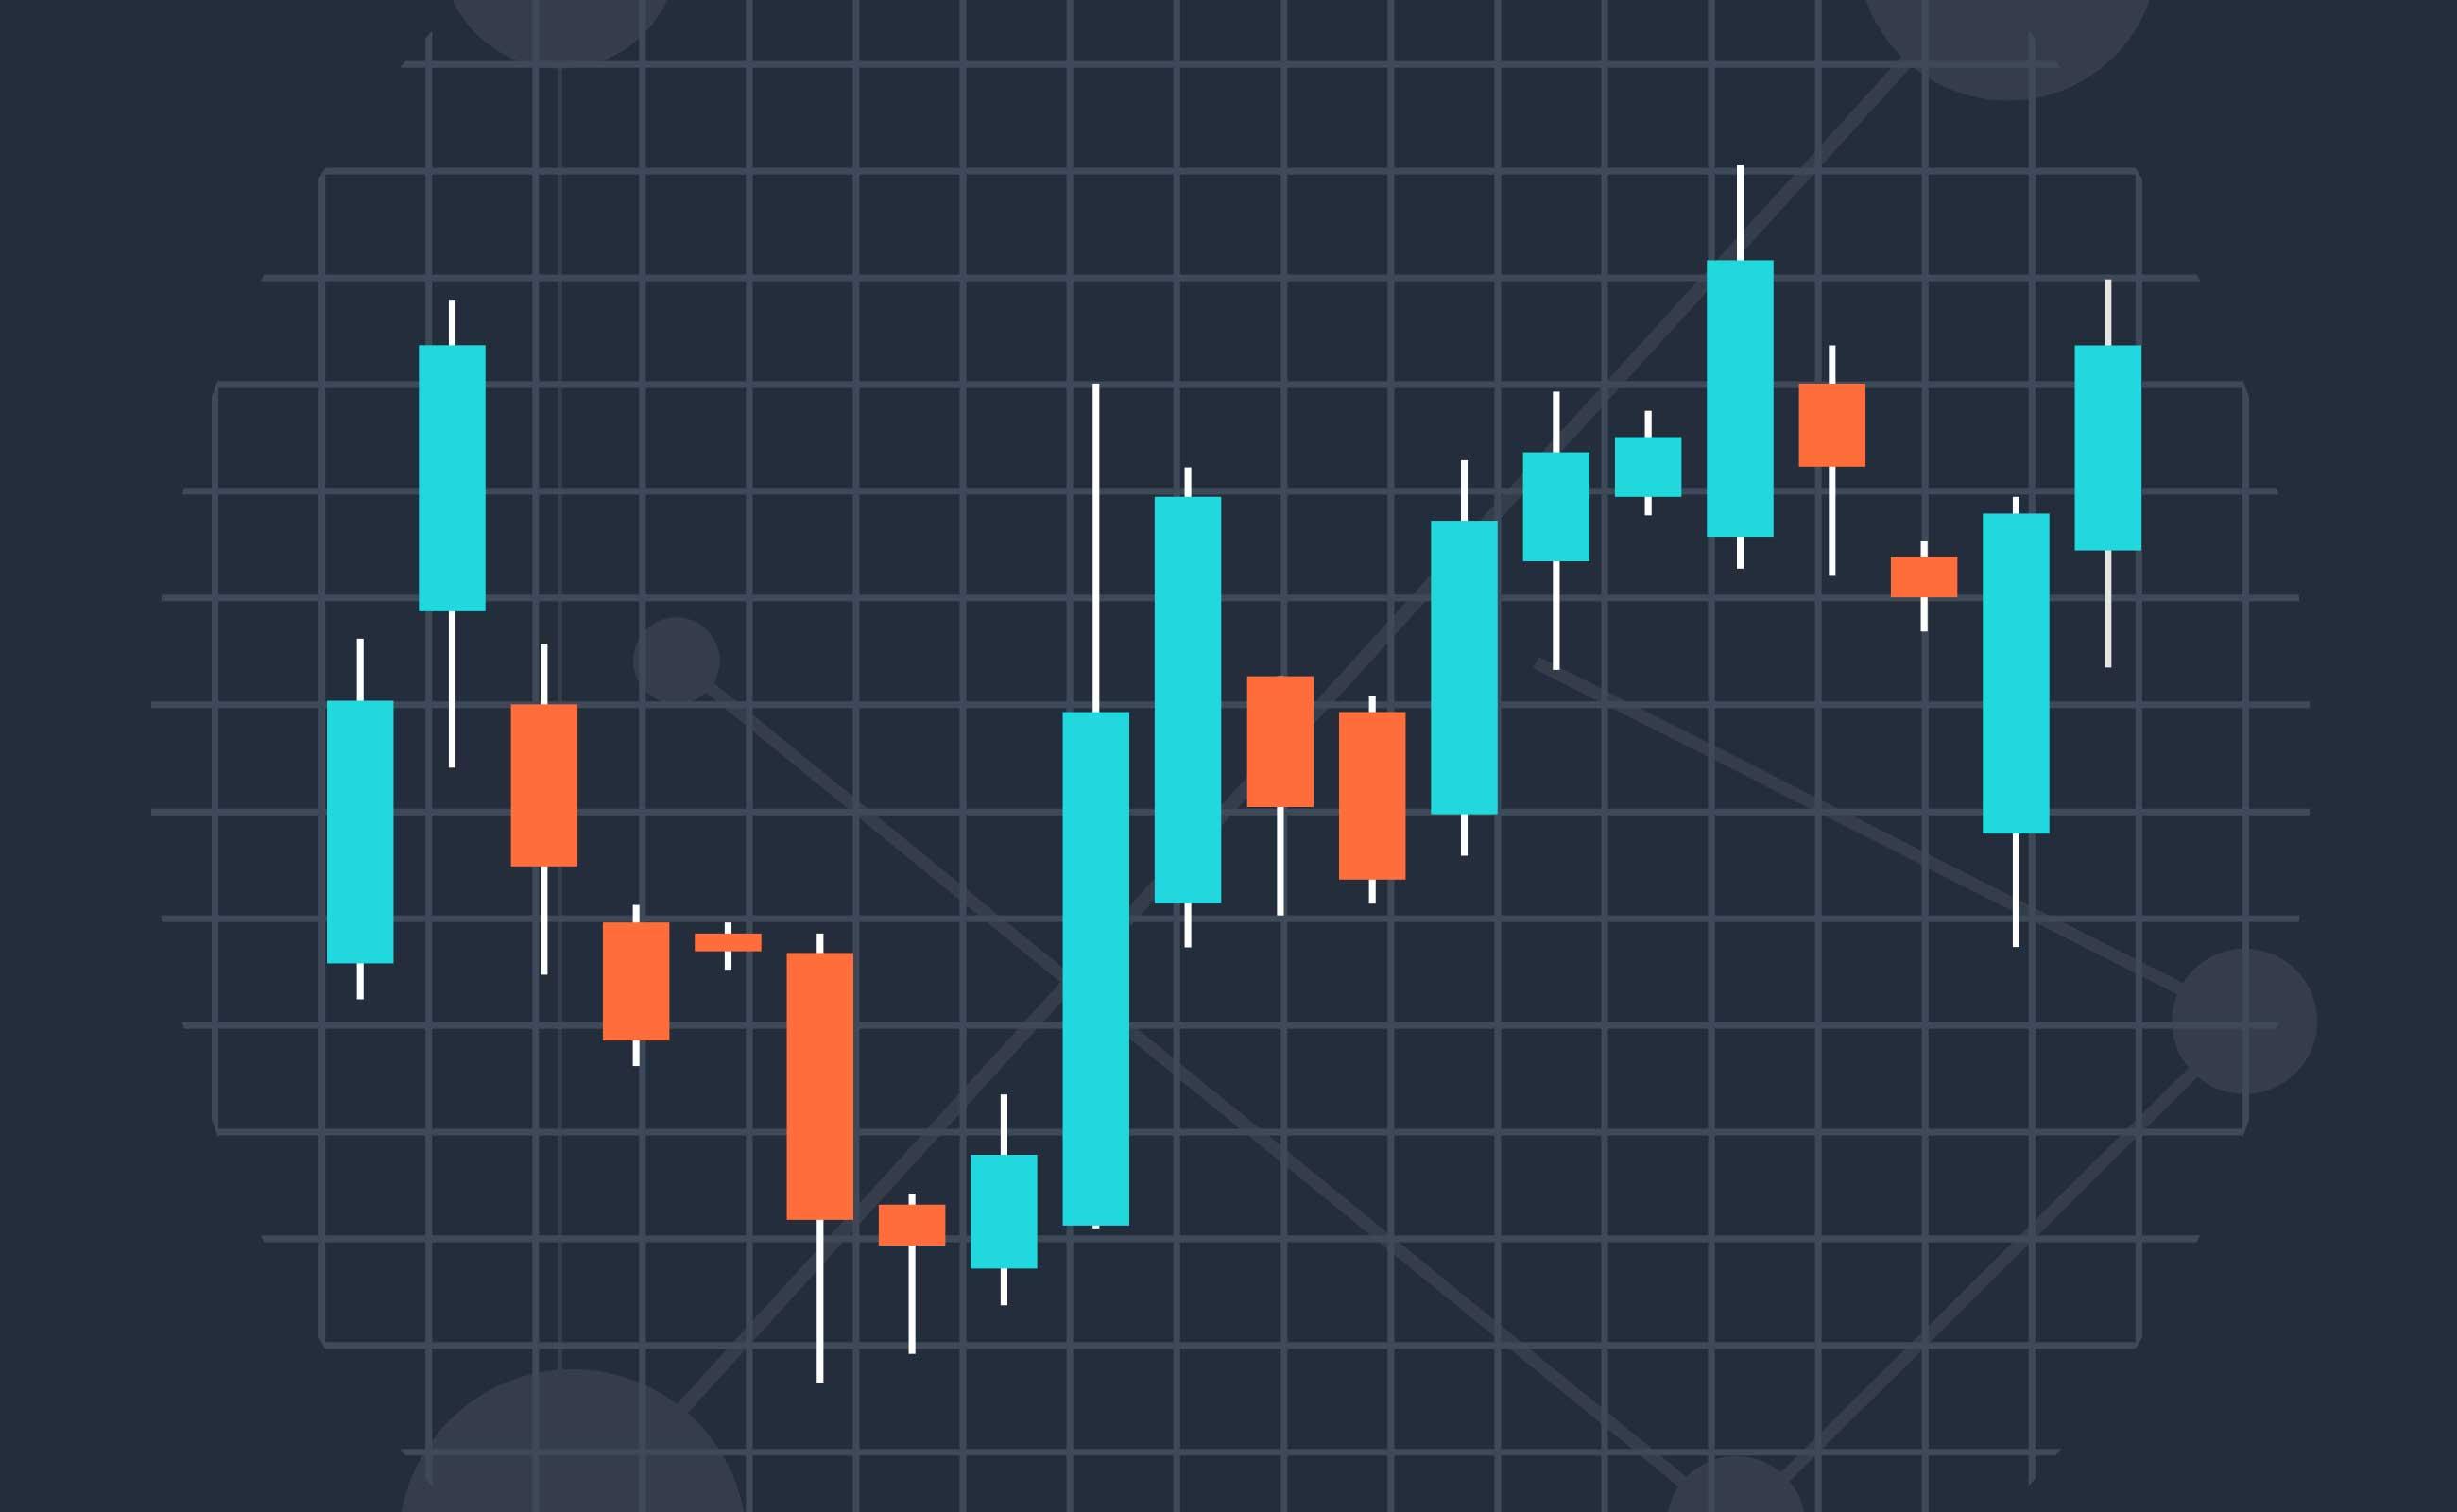 A股迎来MSCI如期扩容 创业板股票首次纳入